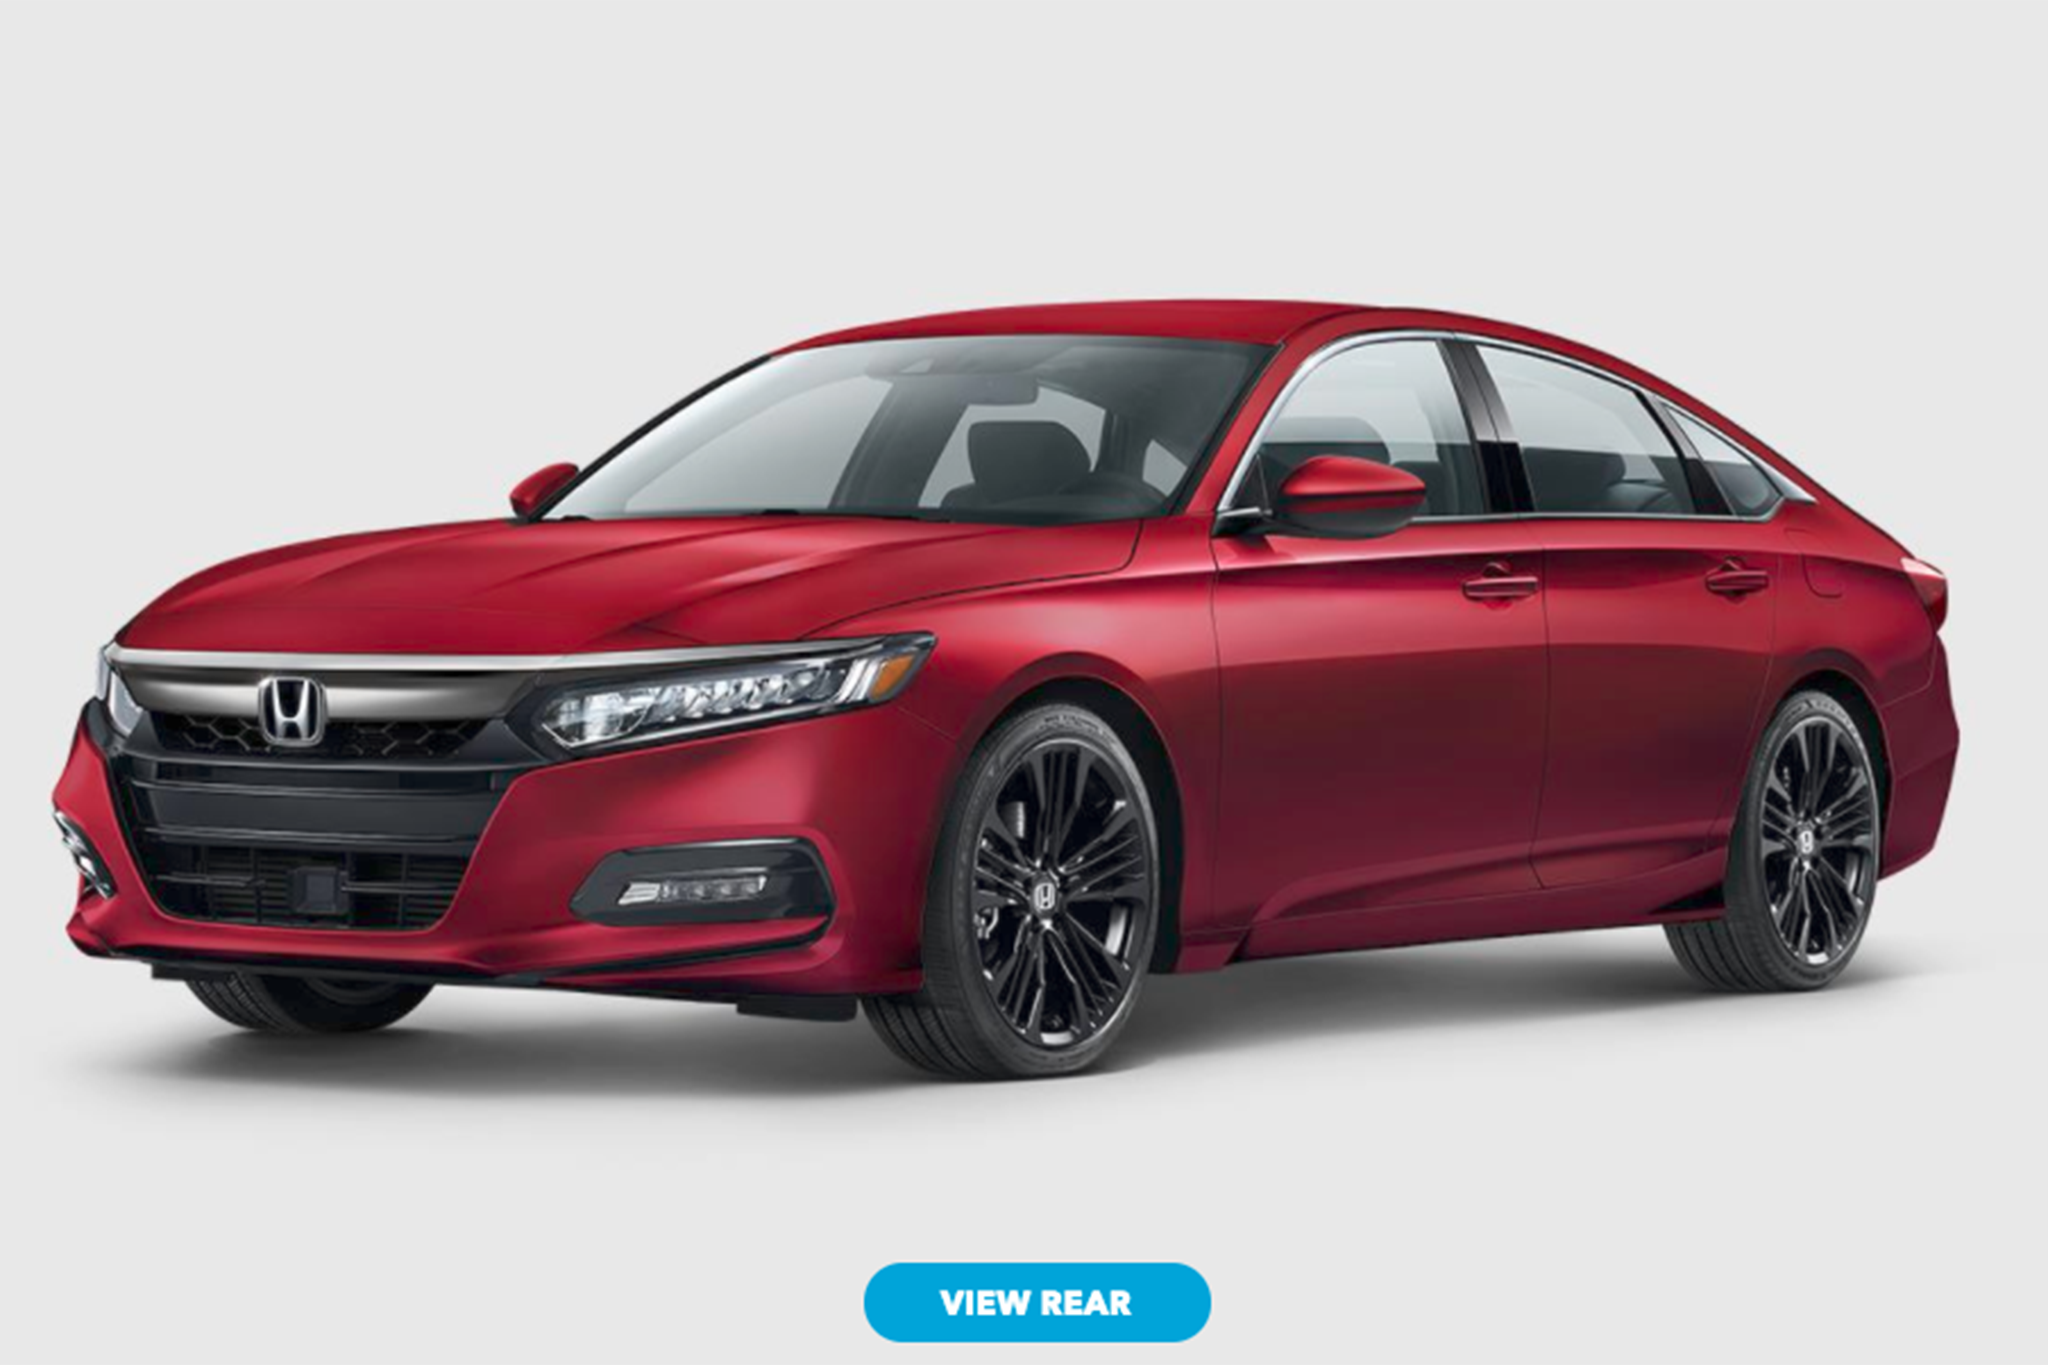 Red Honda Accord Sport >> 2018 Honda Accord Configurator is Live | Automobile Magazine